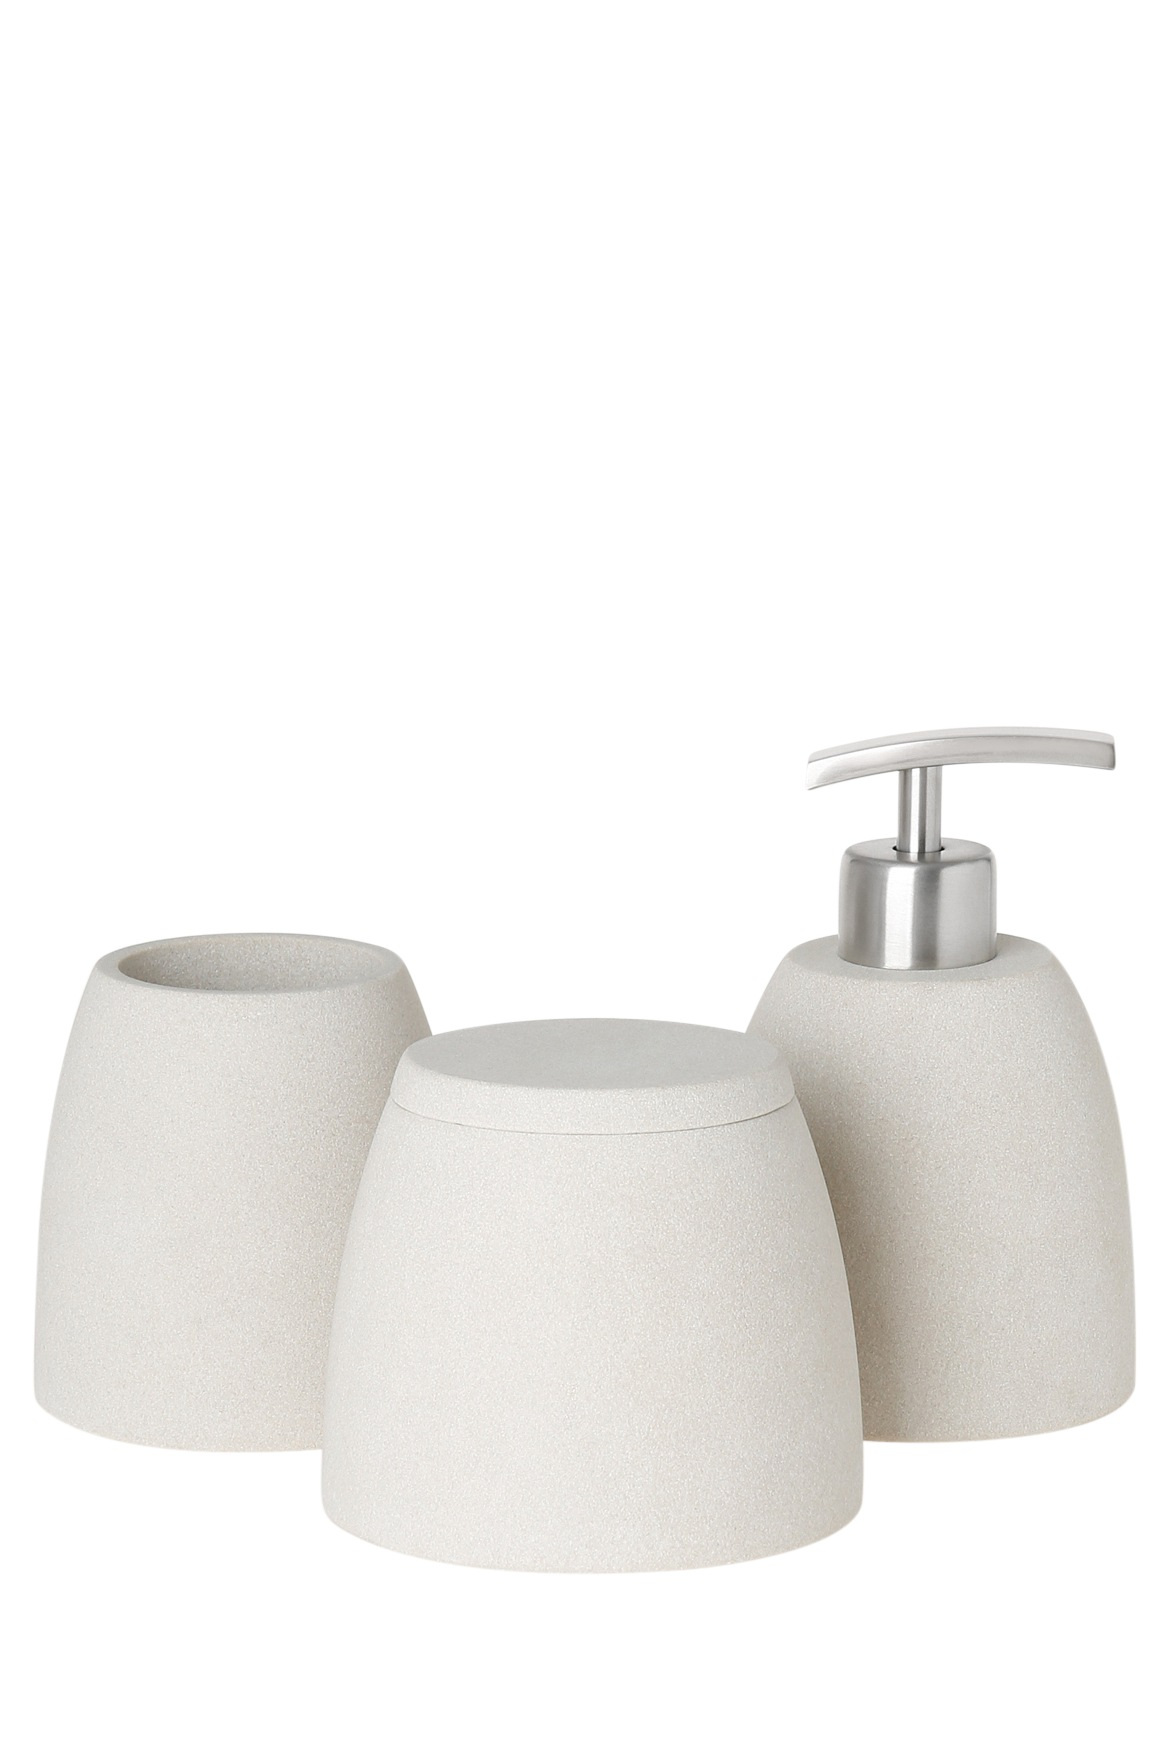 Myer bathroom accessories - Myer Bathroom Accessories 4